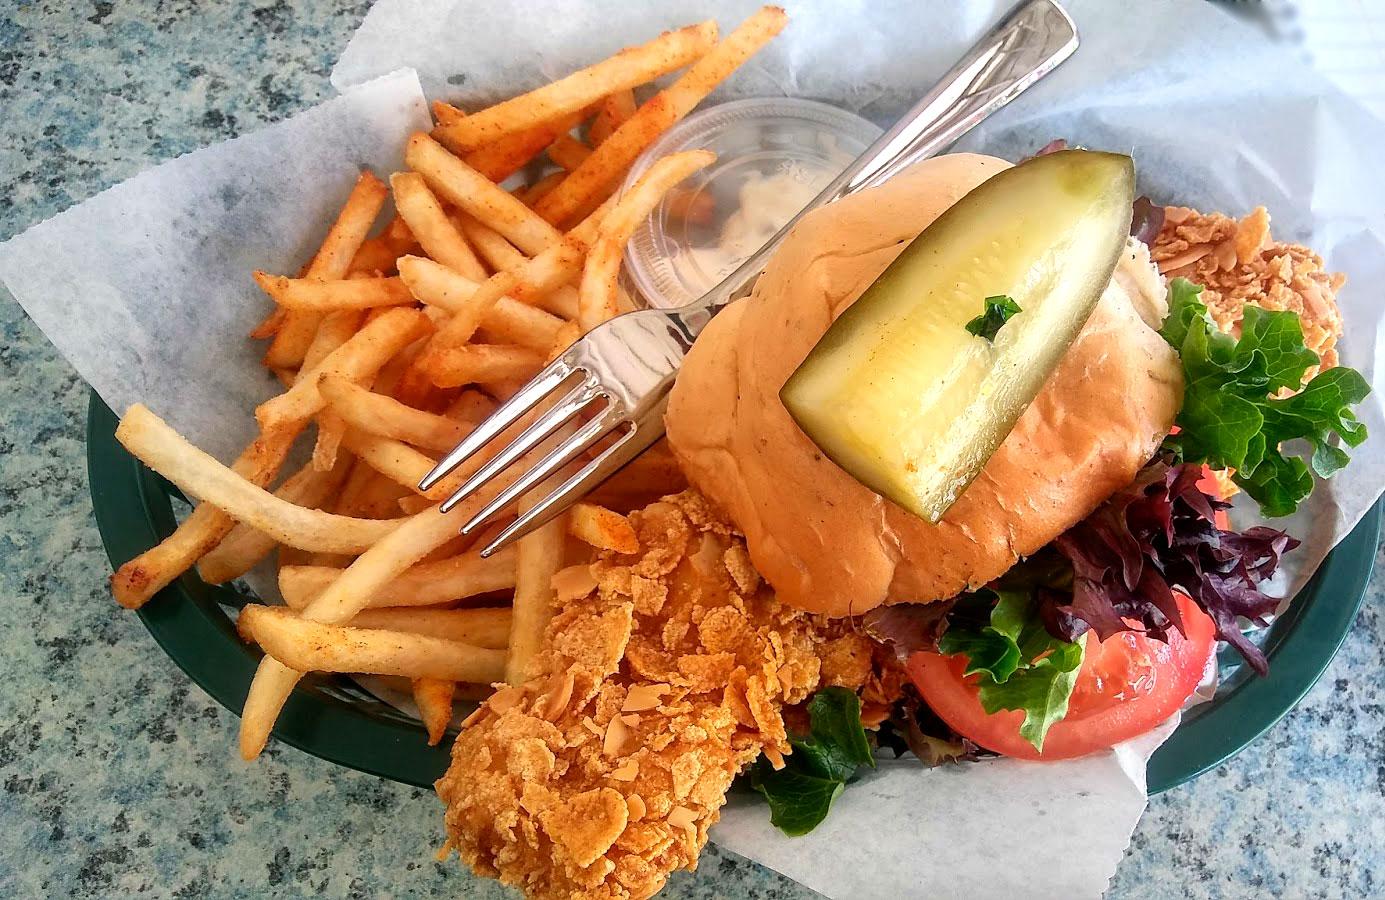 Tavern at Bayboro Crunchy Grouper Sandwich